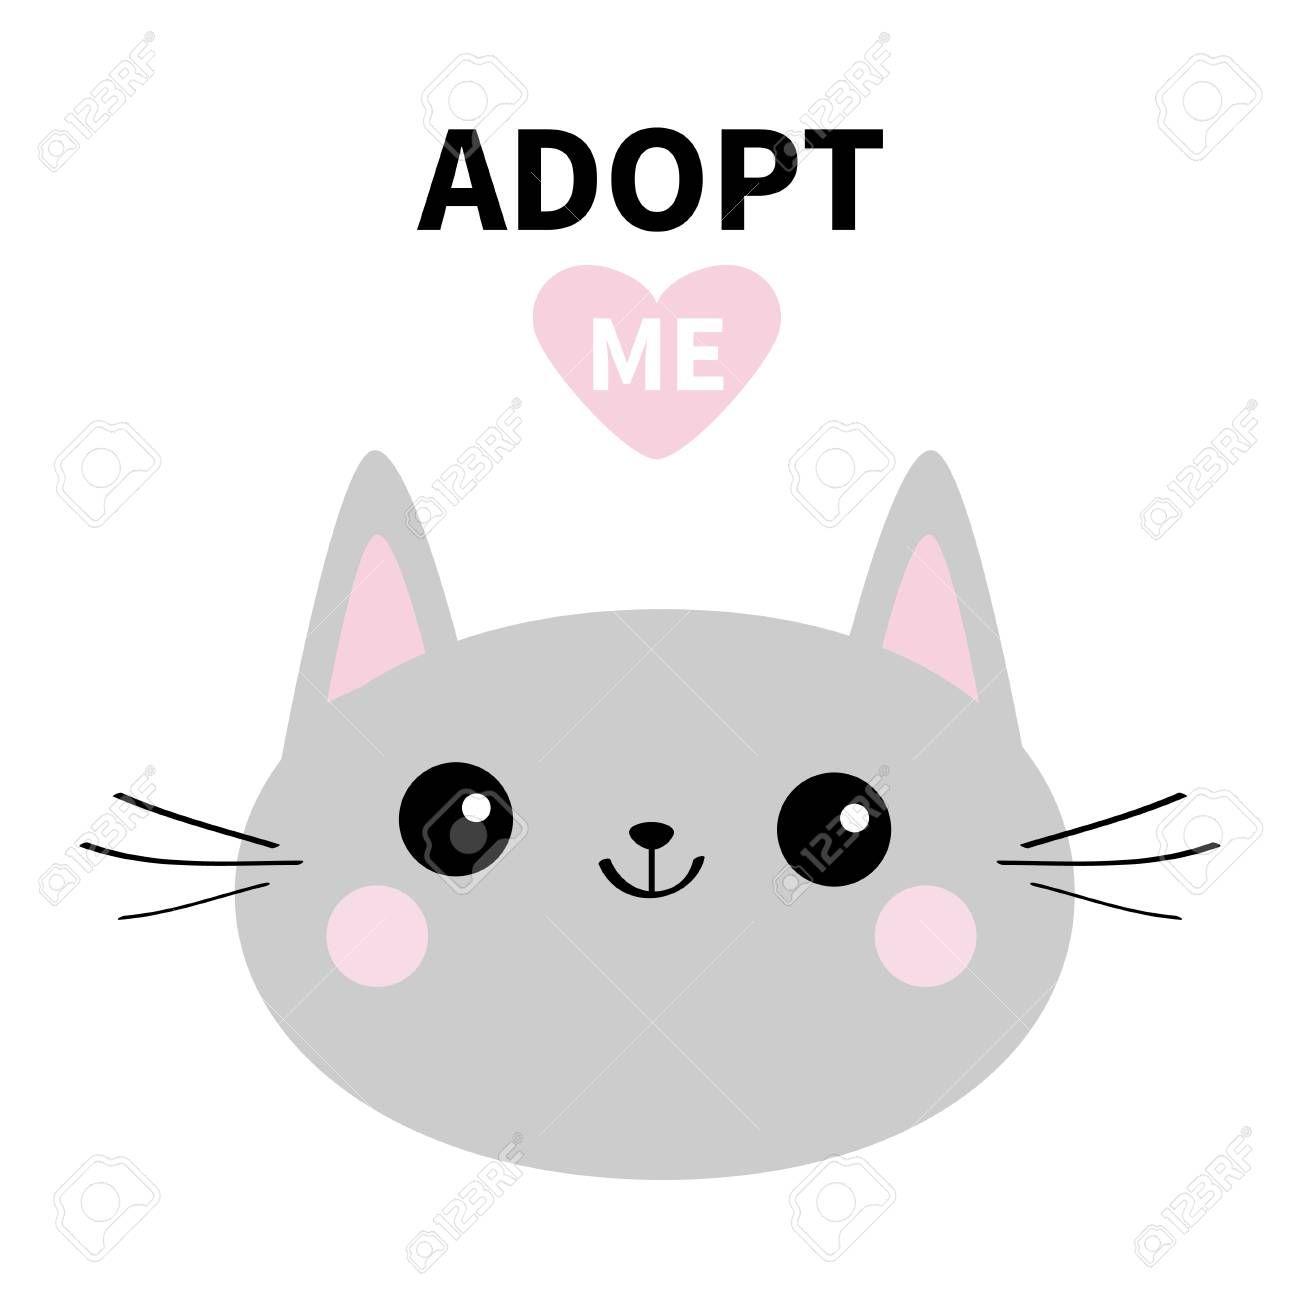 Adopt Me Dont Buy Gray Cat Round Head Silhouette Pink Heart Pet Adoption Kawaii Animal Cute C Cat Silhouette Kawaii Animals Digital Illustration Tutorial